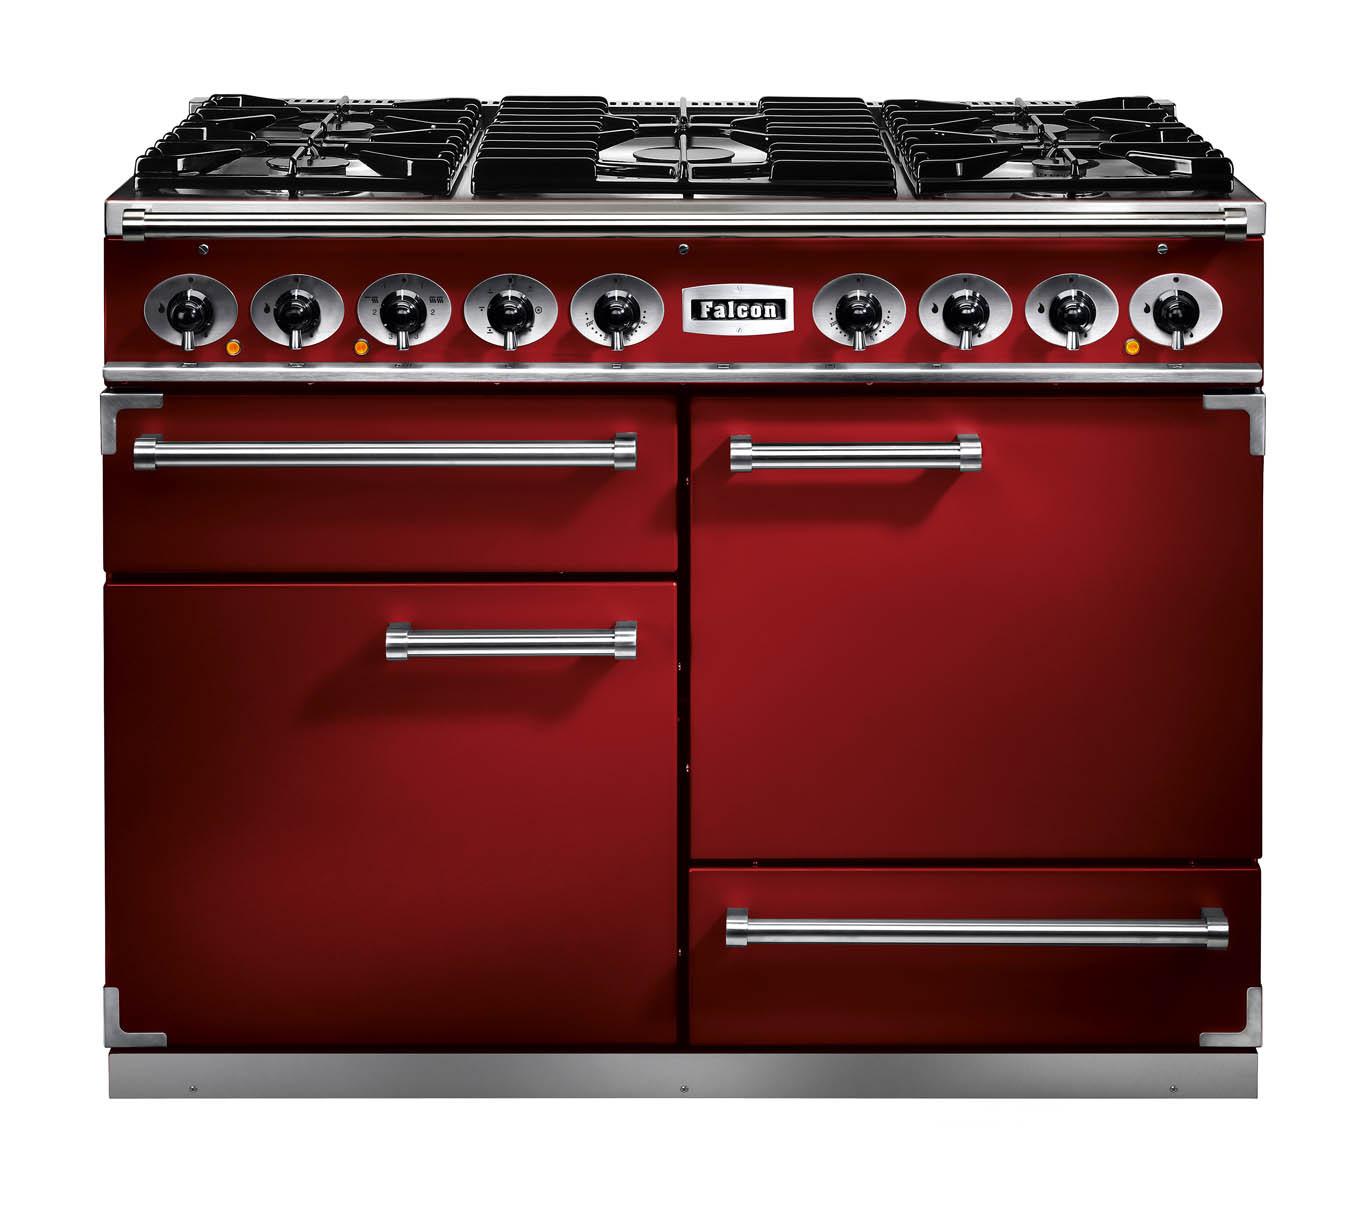 Falcon 1092 Deluxe Dual Fuel Cherry Red/Nickel Range Cooker